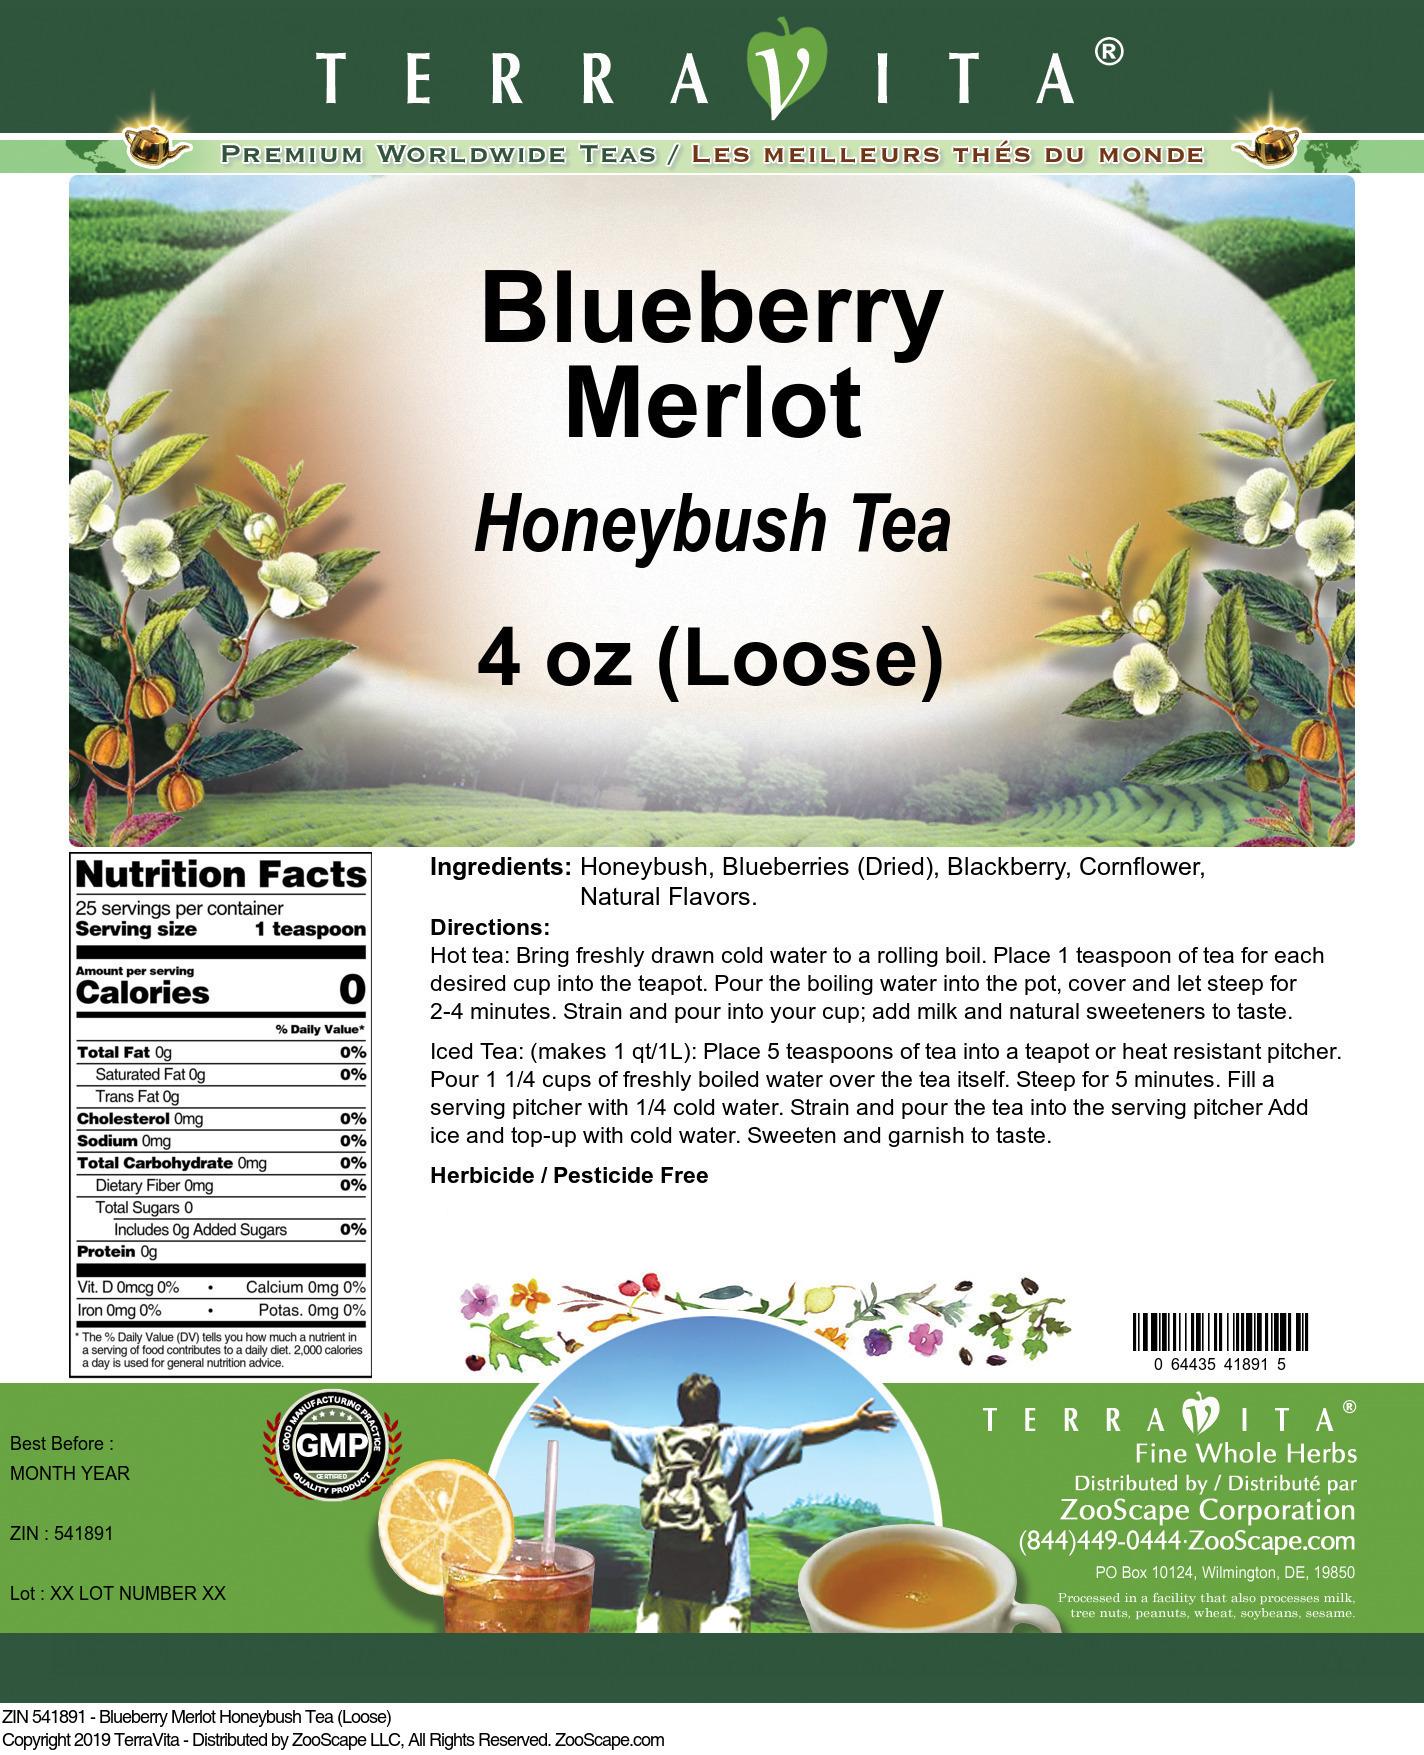 Blueberry Merlot Honeybush Tea (Loose)